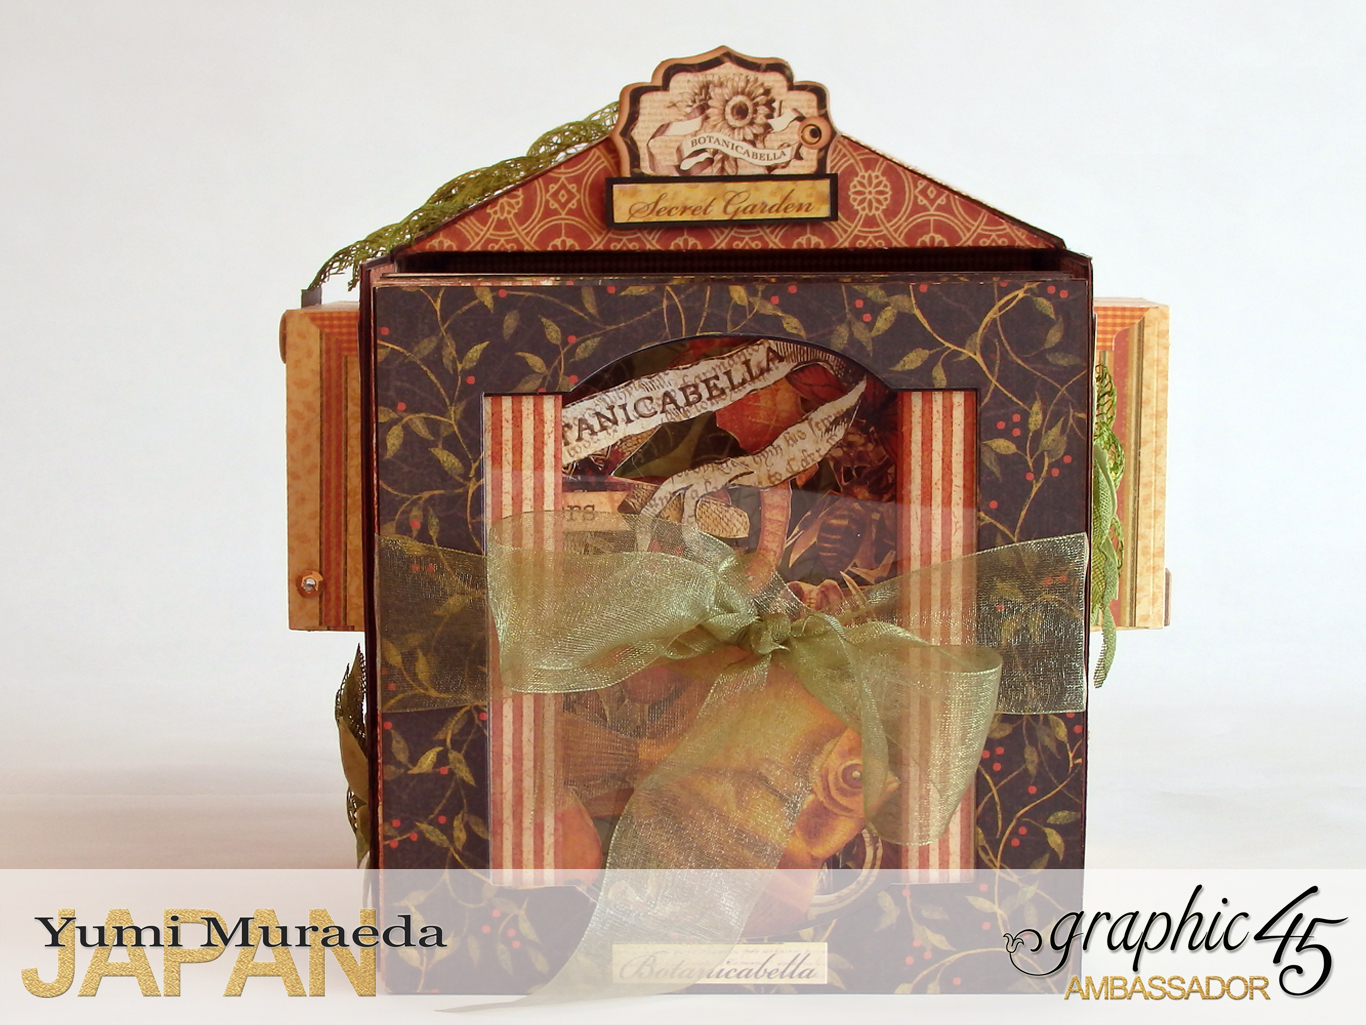 5Secret Gaden Museum, Botanicabella, by Yumi Muraeda, Product by Graphic 45jpg